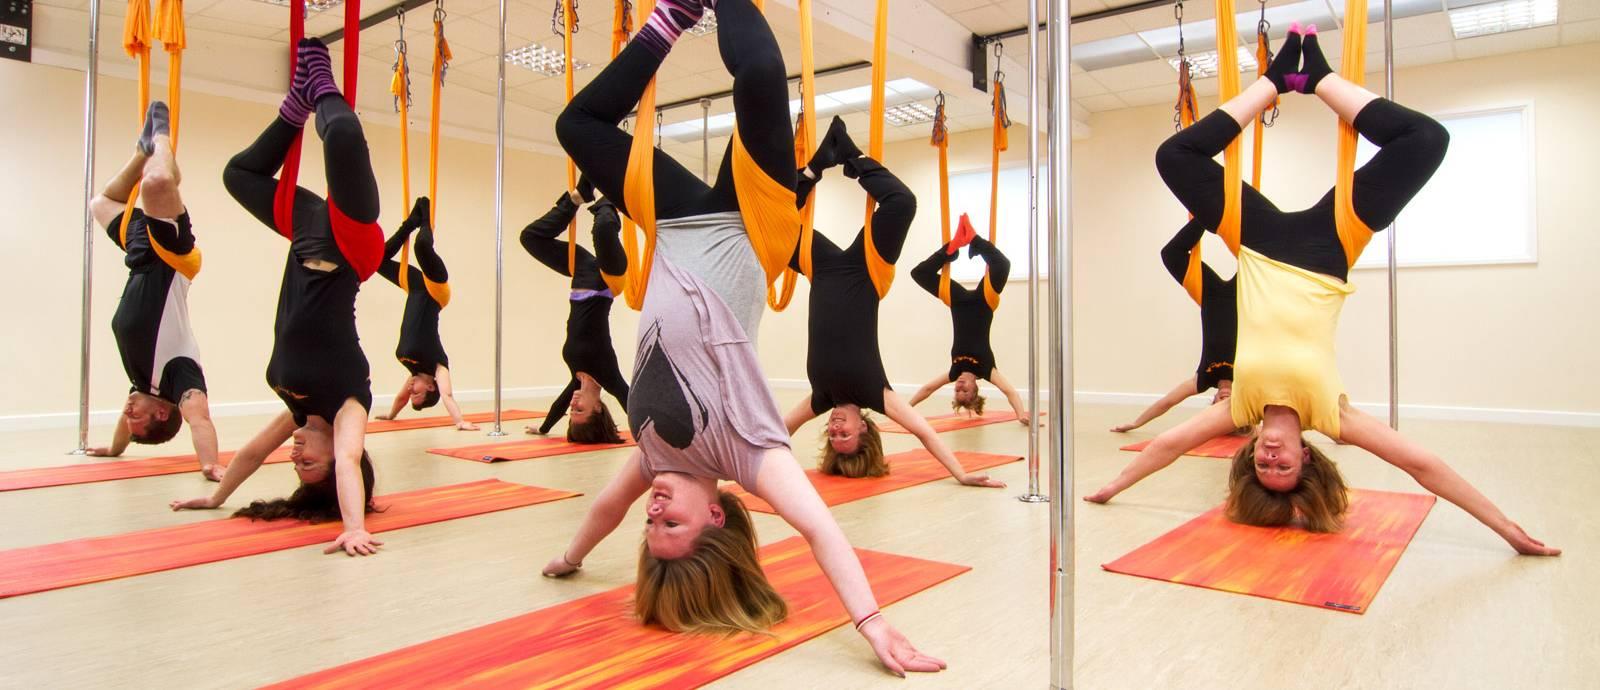 aerial-hammocks-yoga-clas.jpg